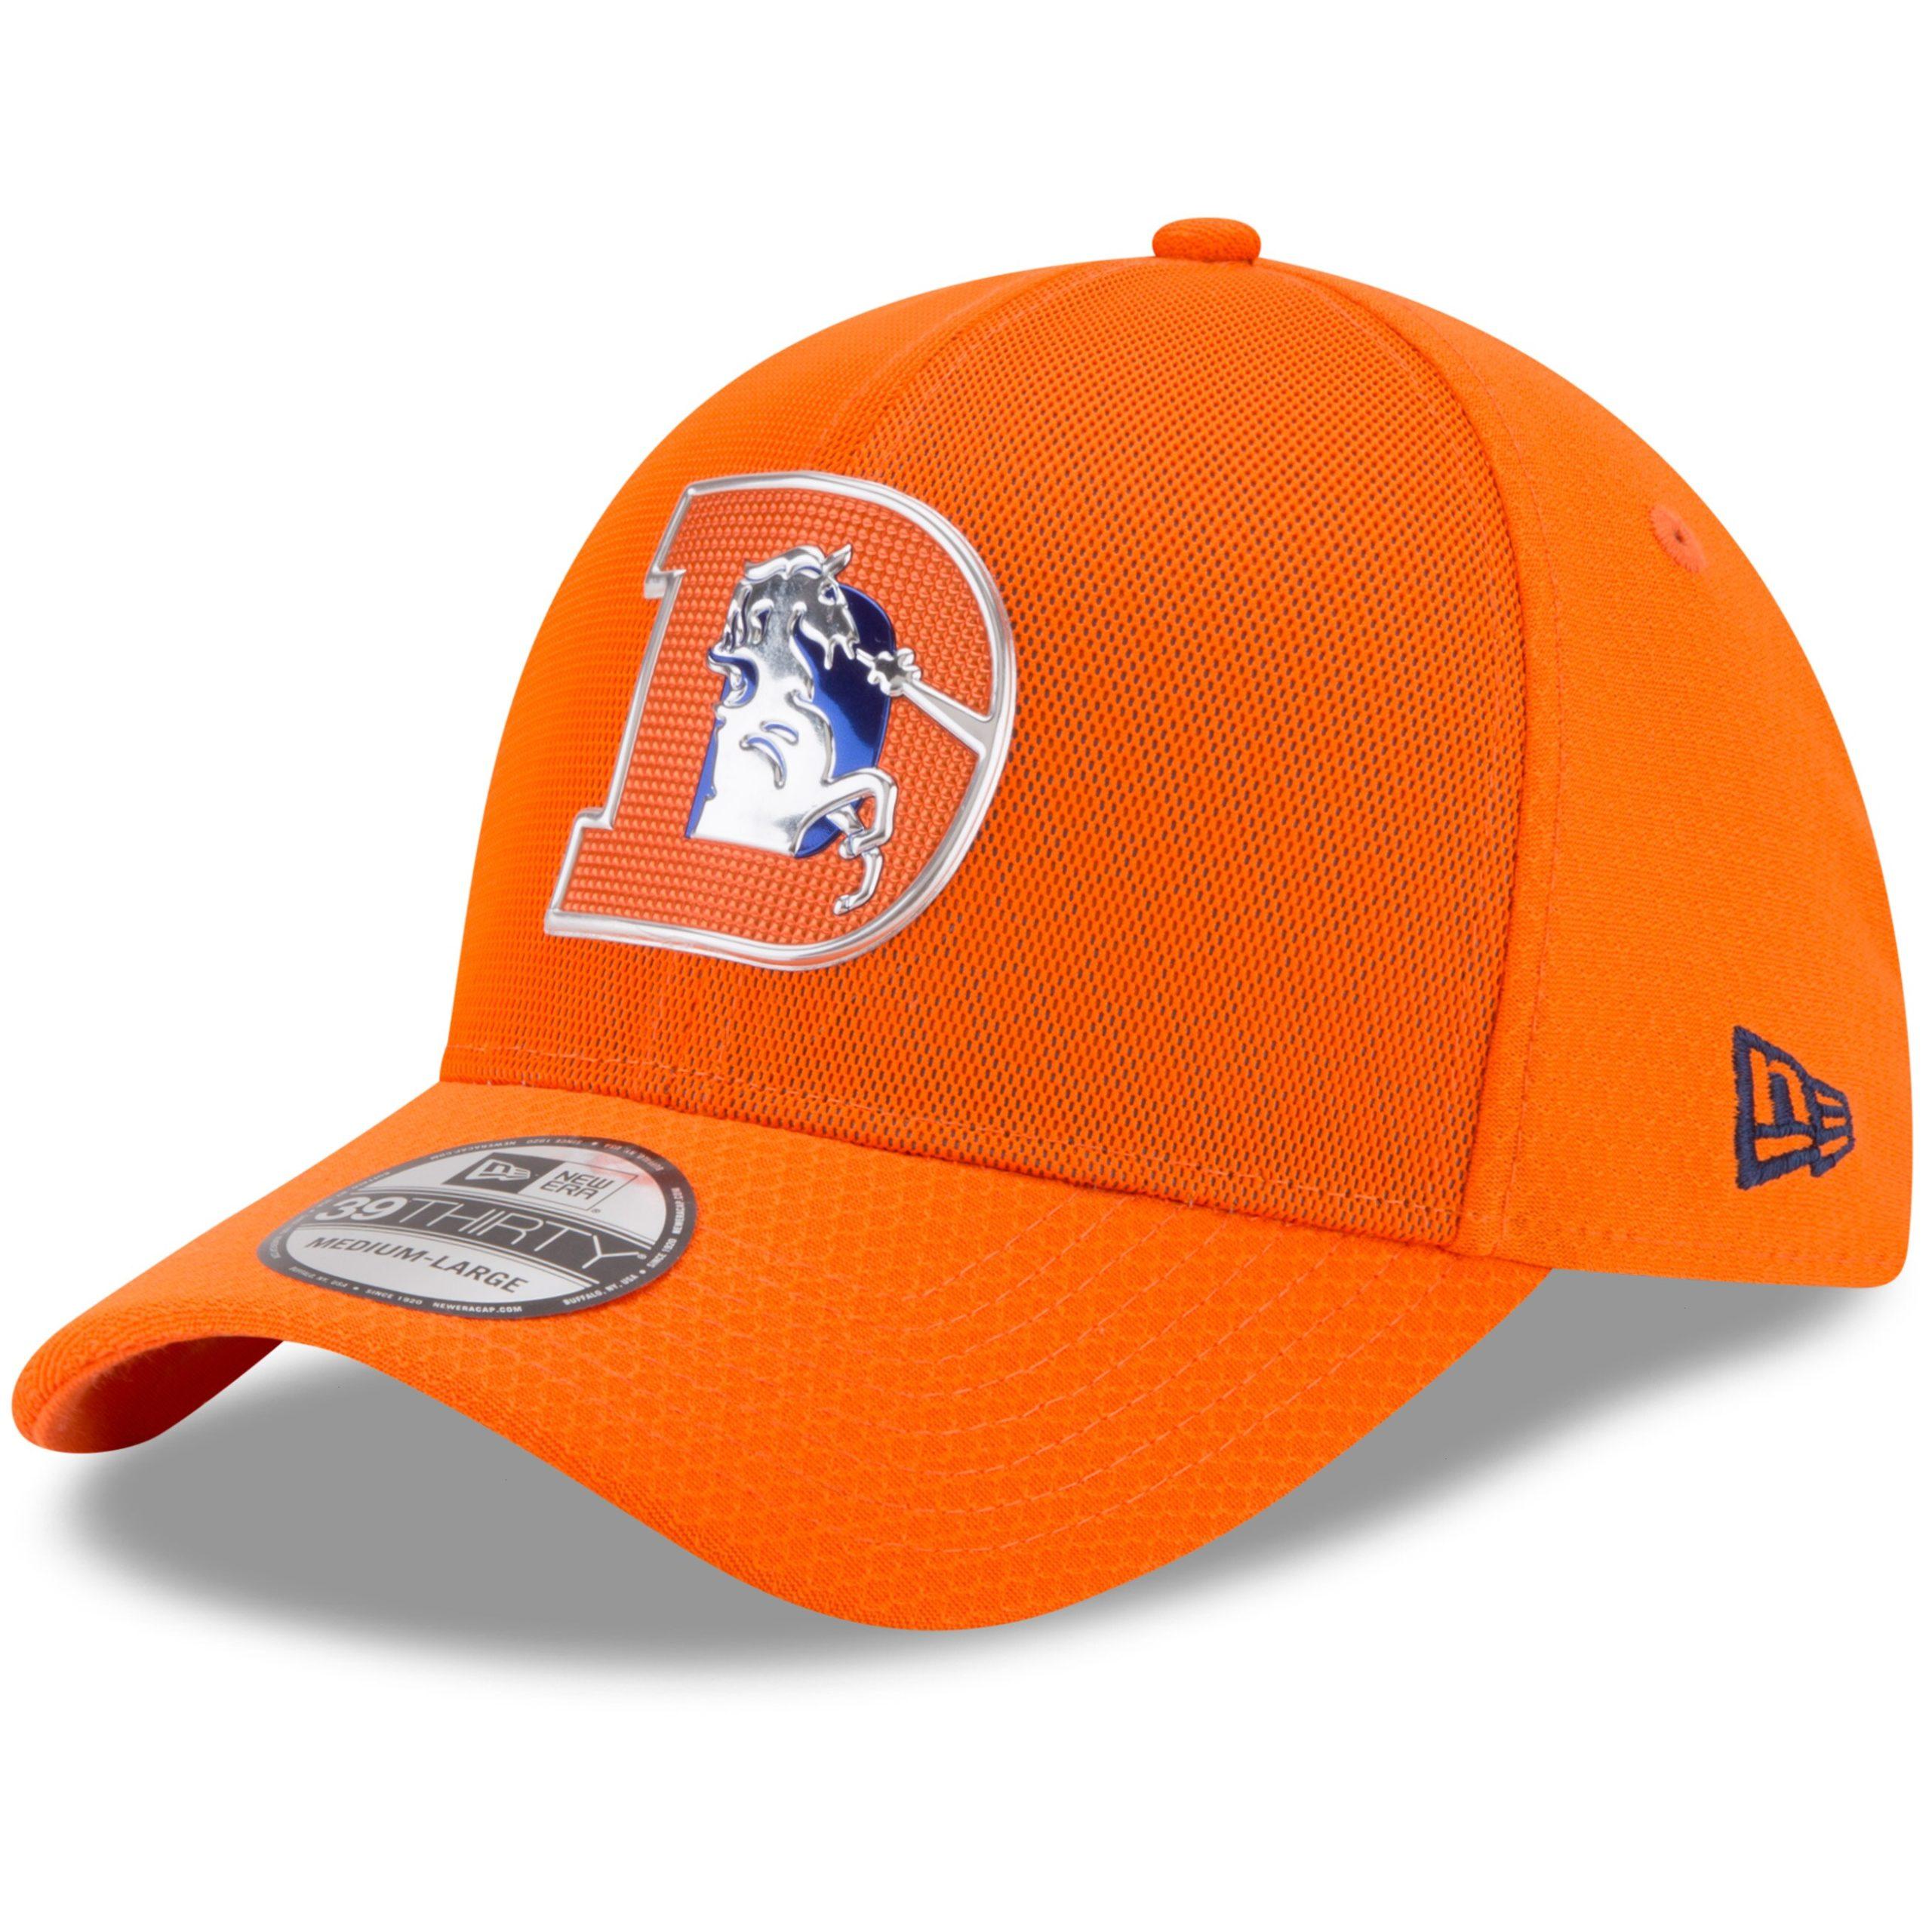 Denver Broncos New Era 2017 Color Rush 39THIRTY Flex Hat - Orange